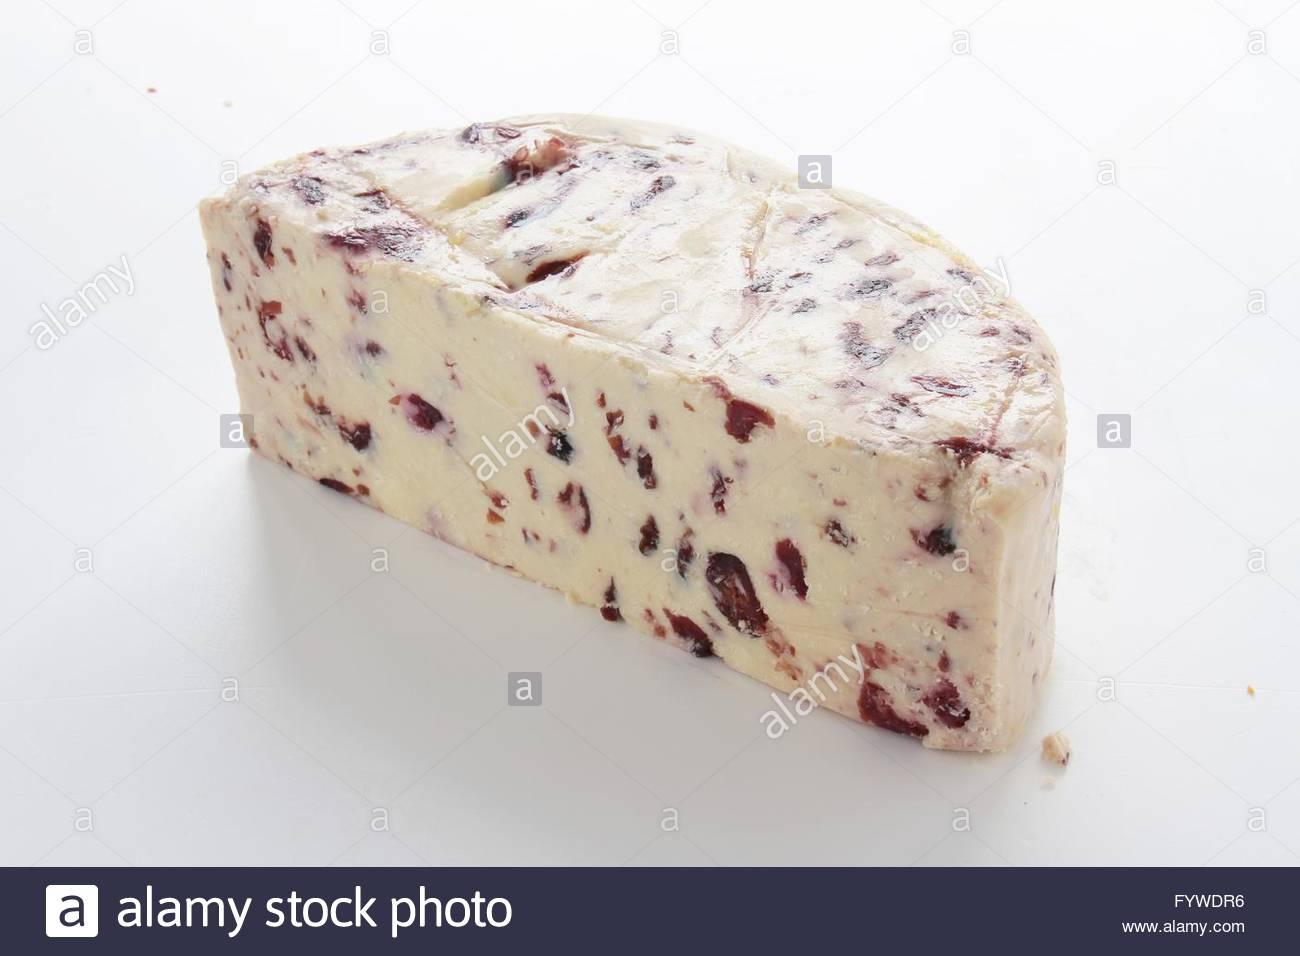 artisan cheese - Stock Image